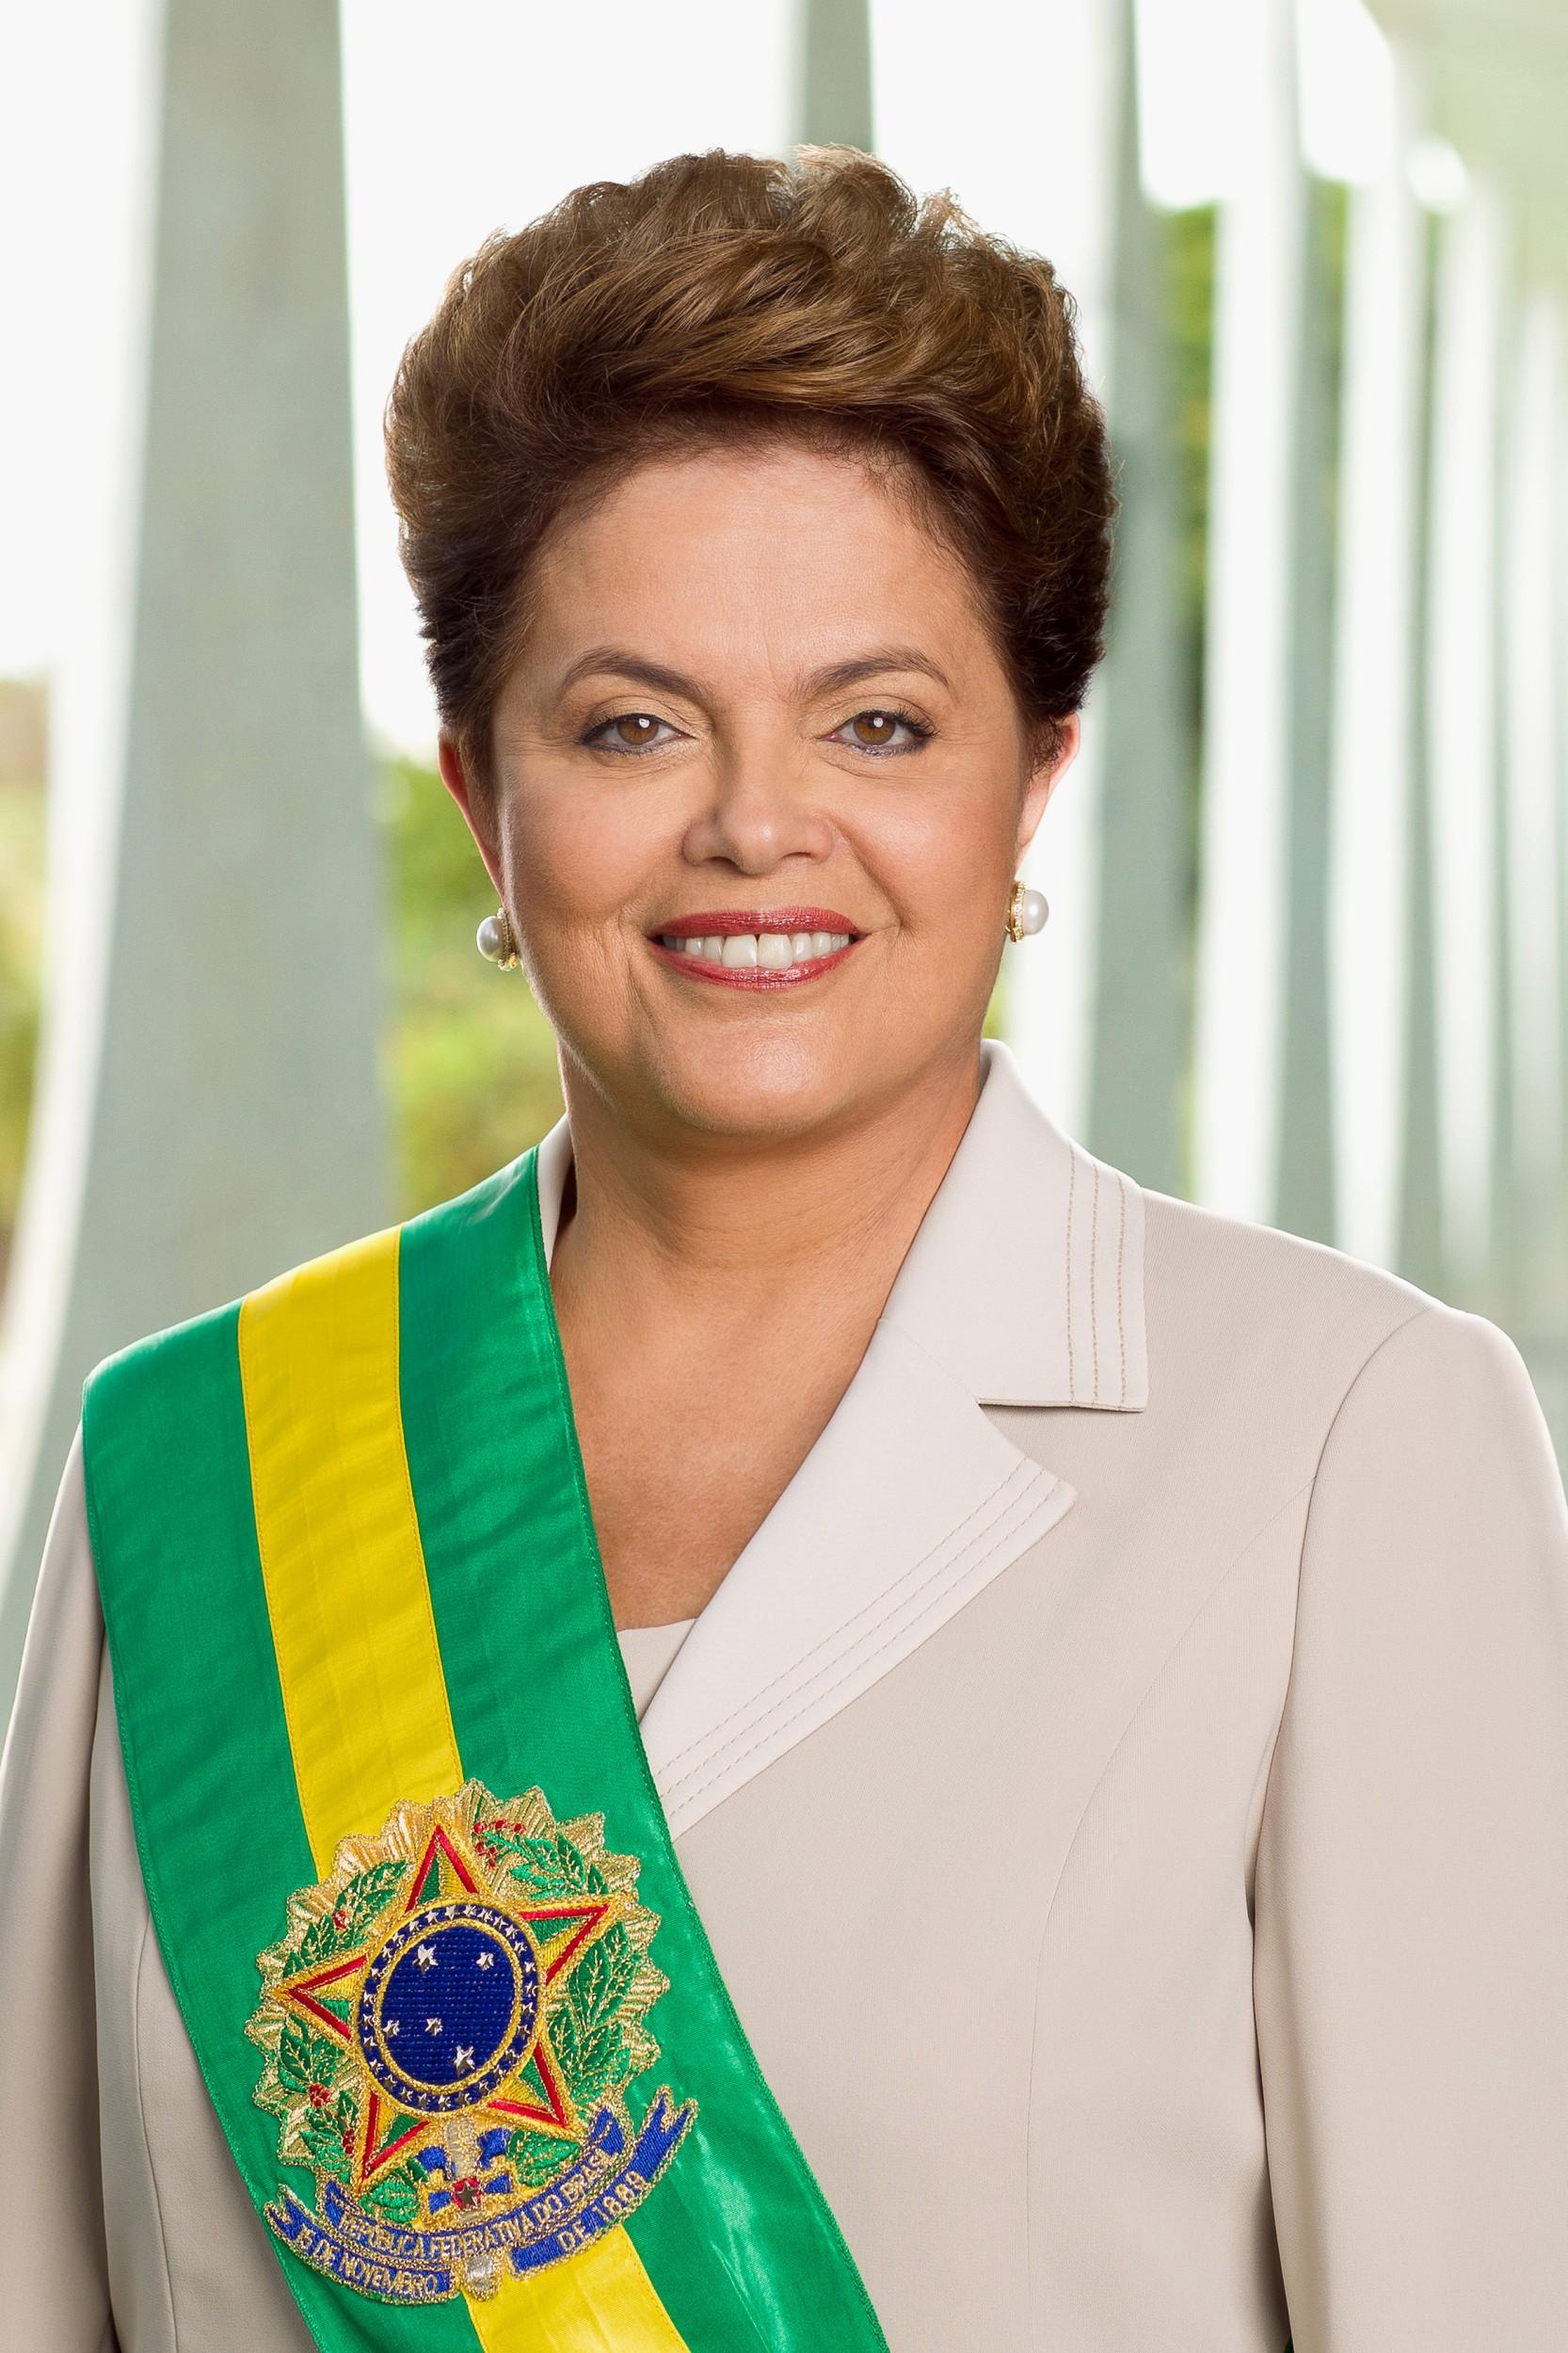 Governo de dilma rousseff 2011 2016 hist ria do brasil infoescola for Casa governo it 2018